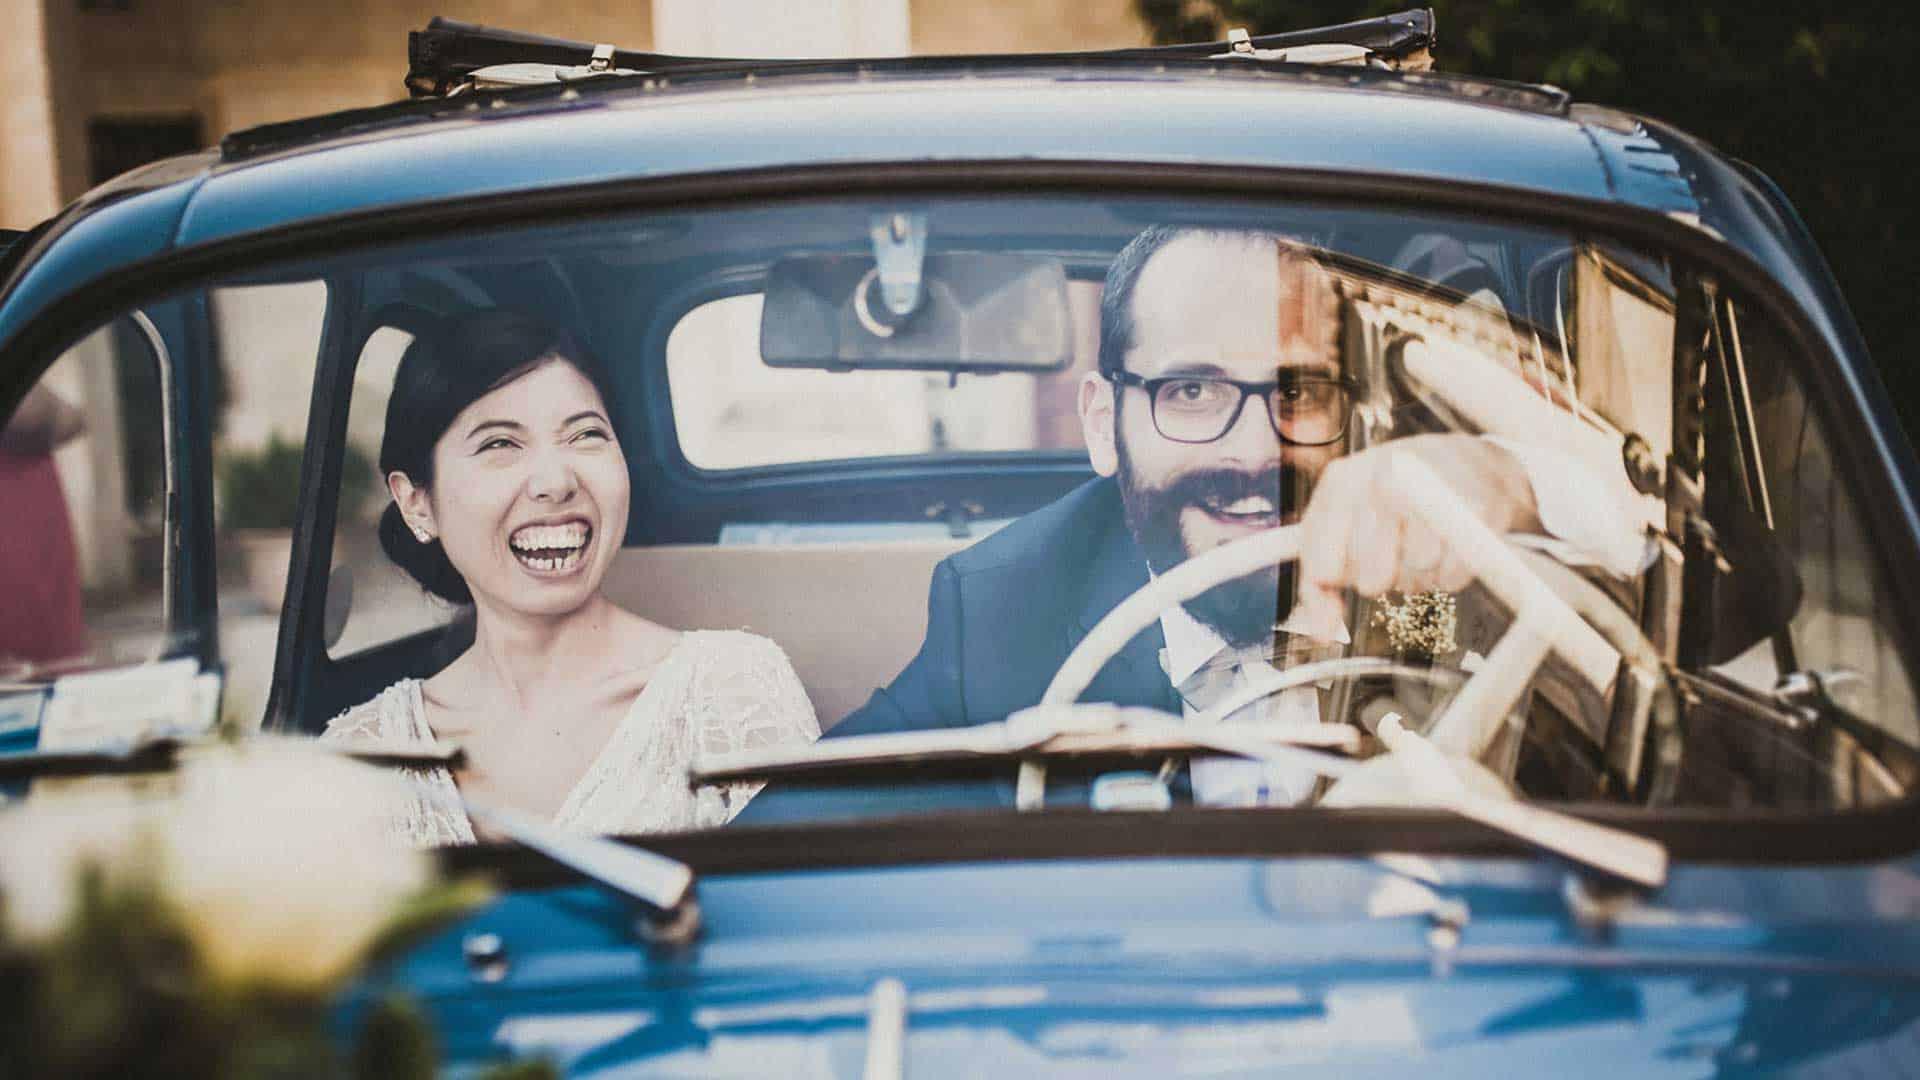 foto andrea fusaro matrimonio treviso81